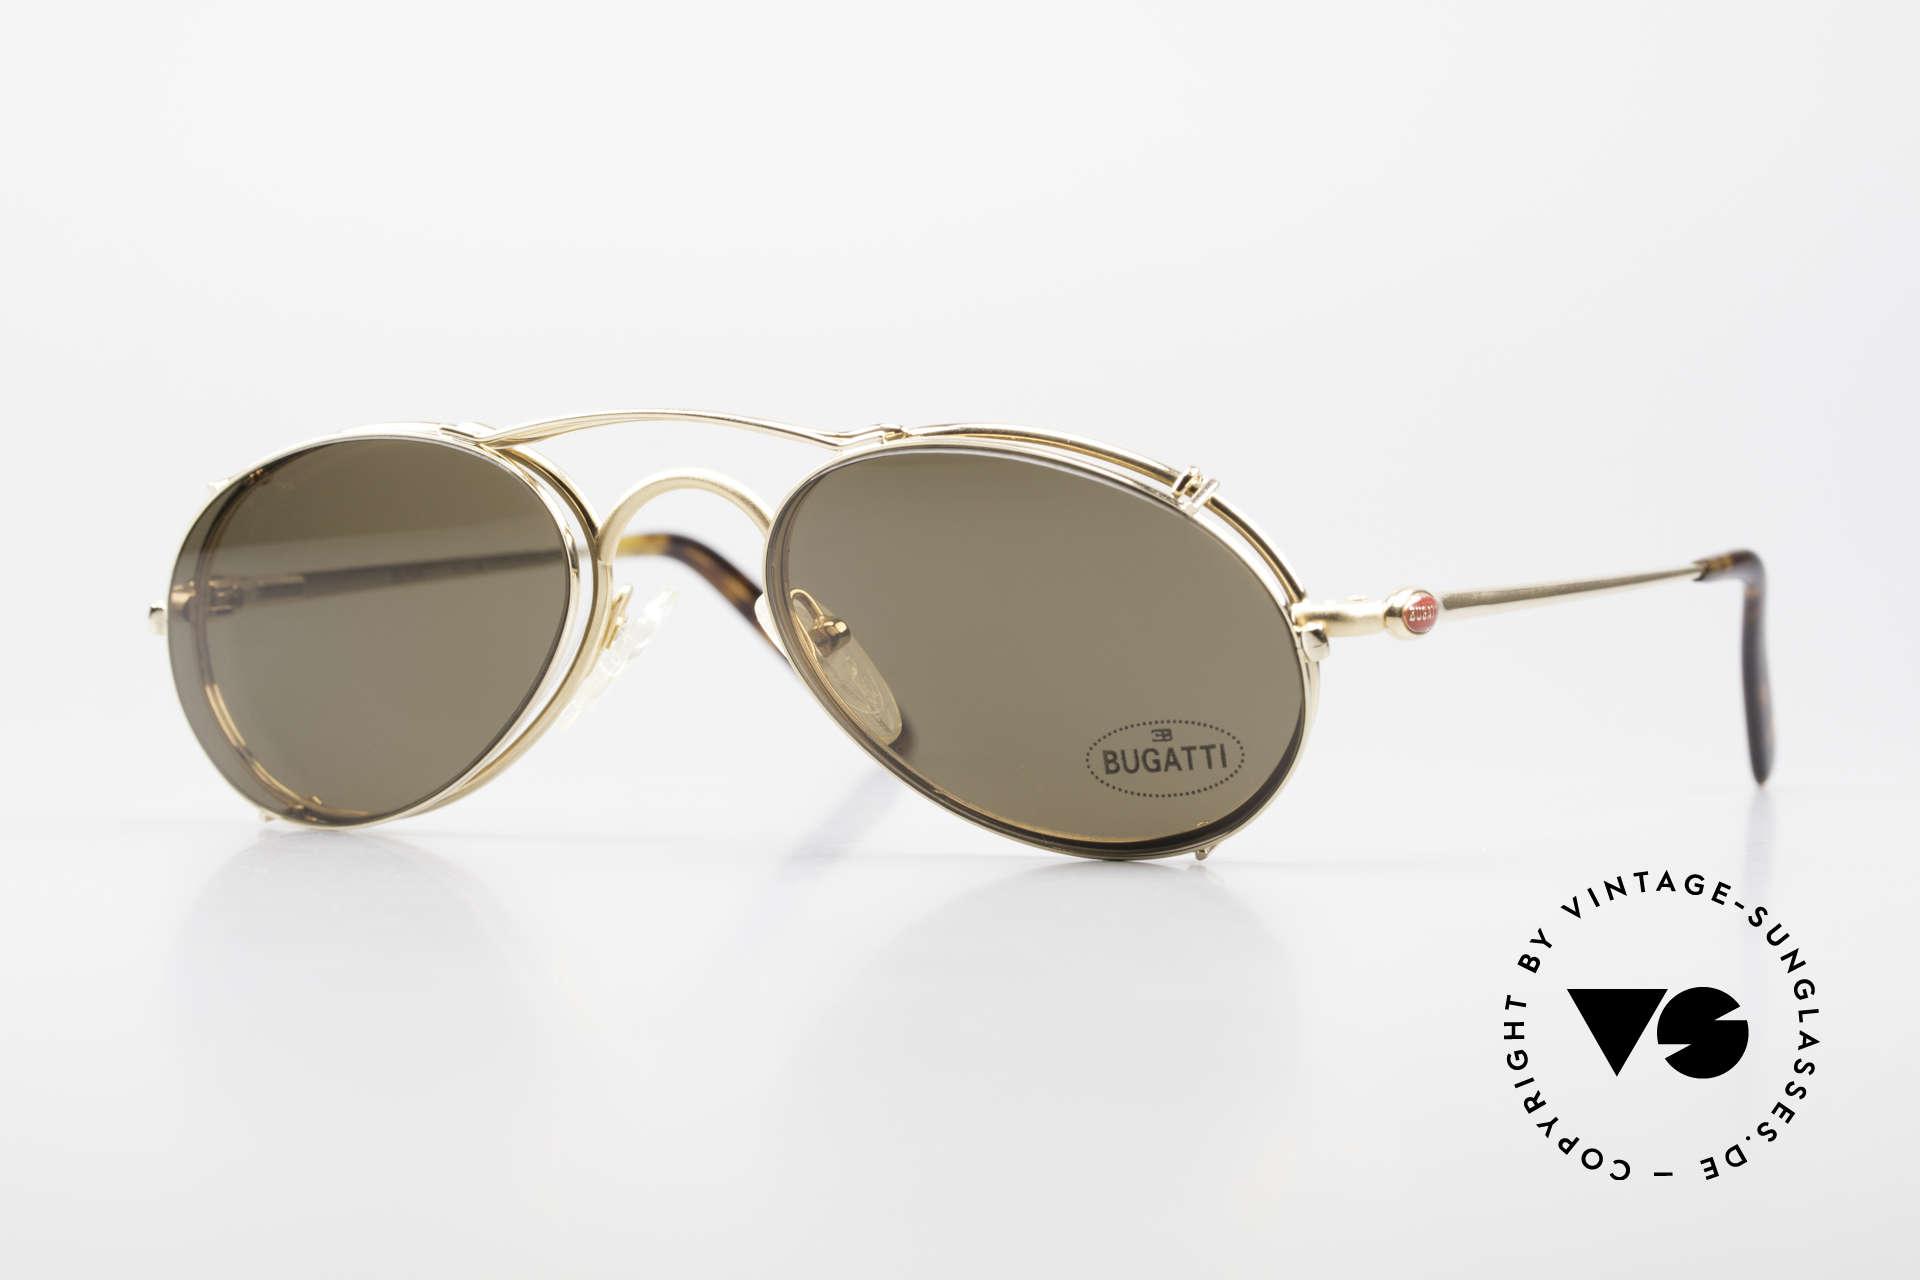 Bugatti 23407 Men's Eyeglasses With Clip On, very elegant vintage Bugatti designer eyeglasses, Made for Men